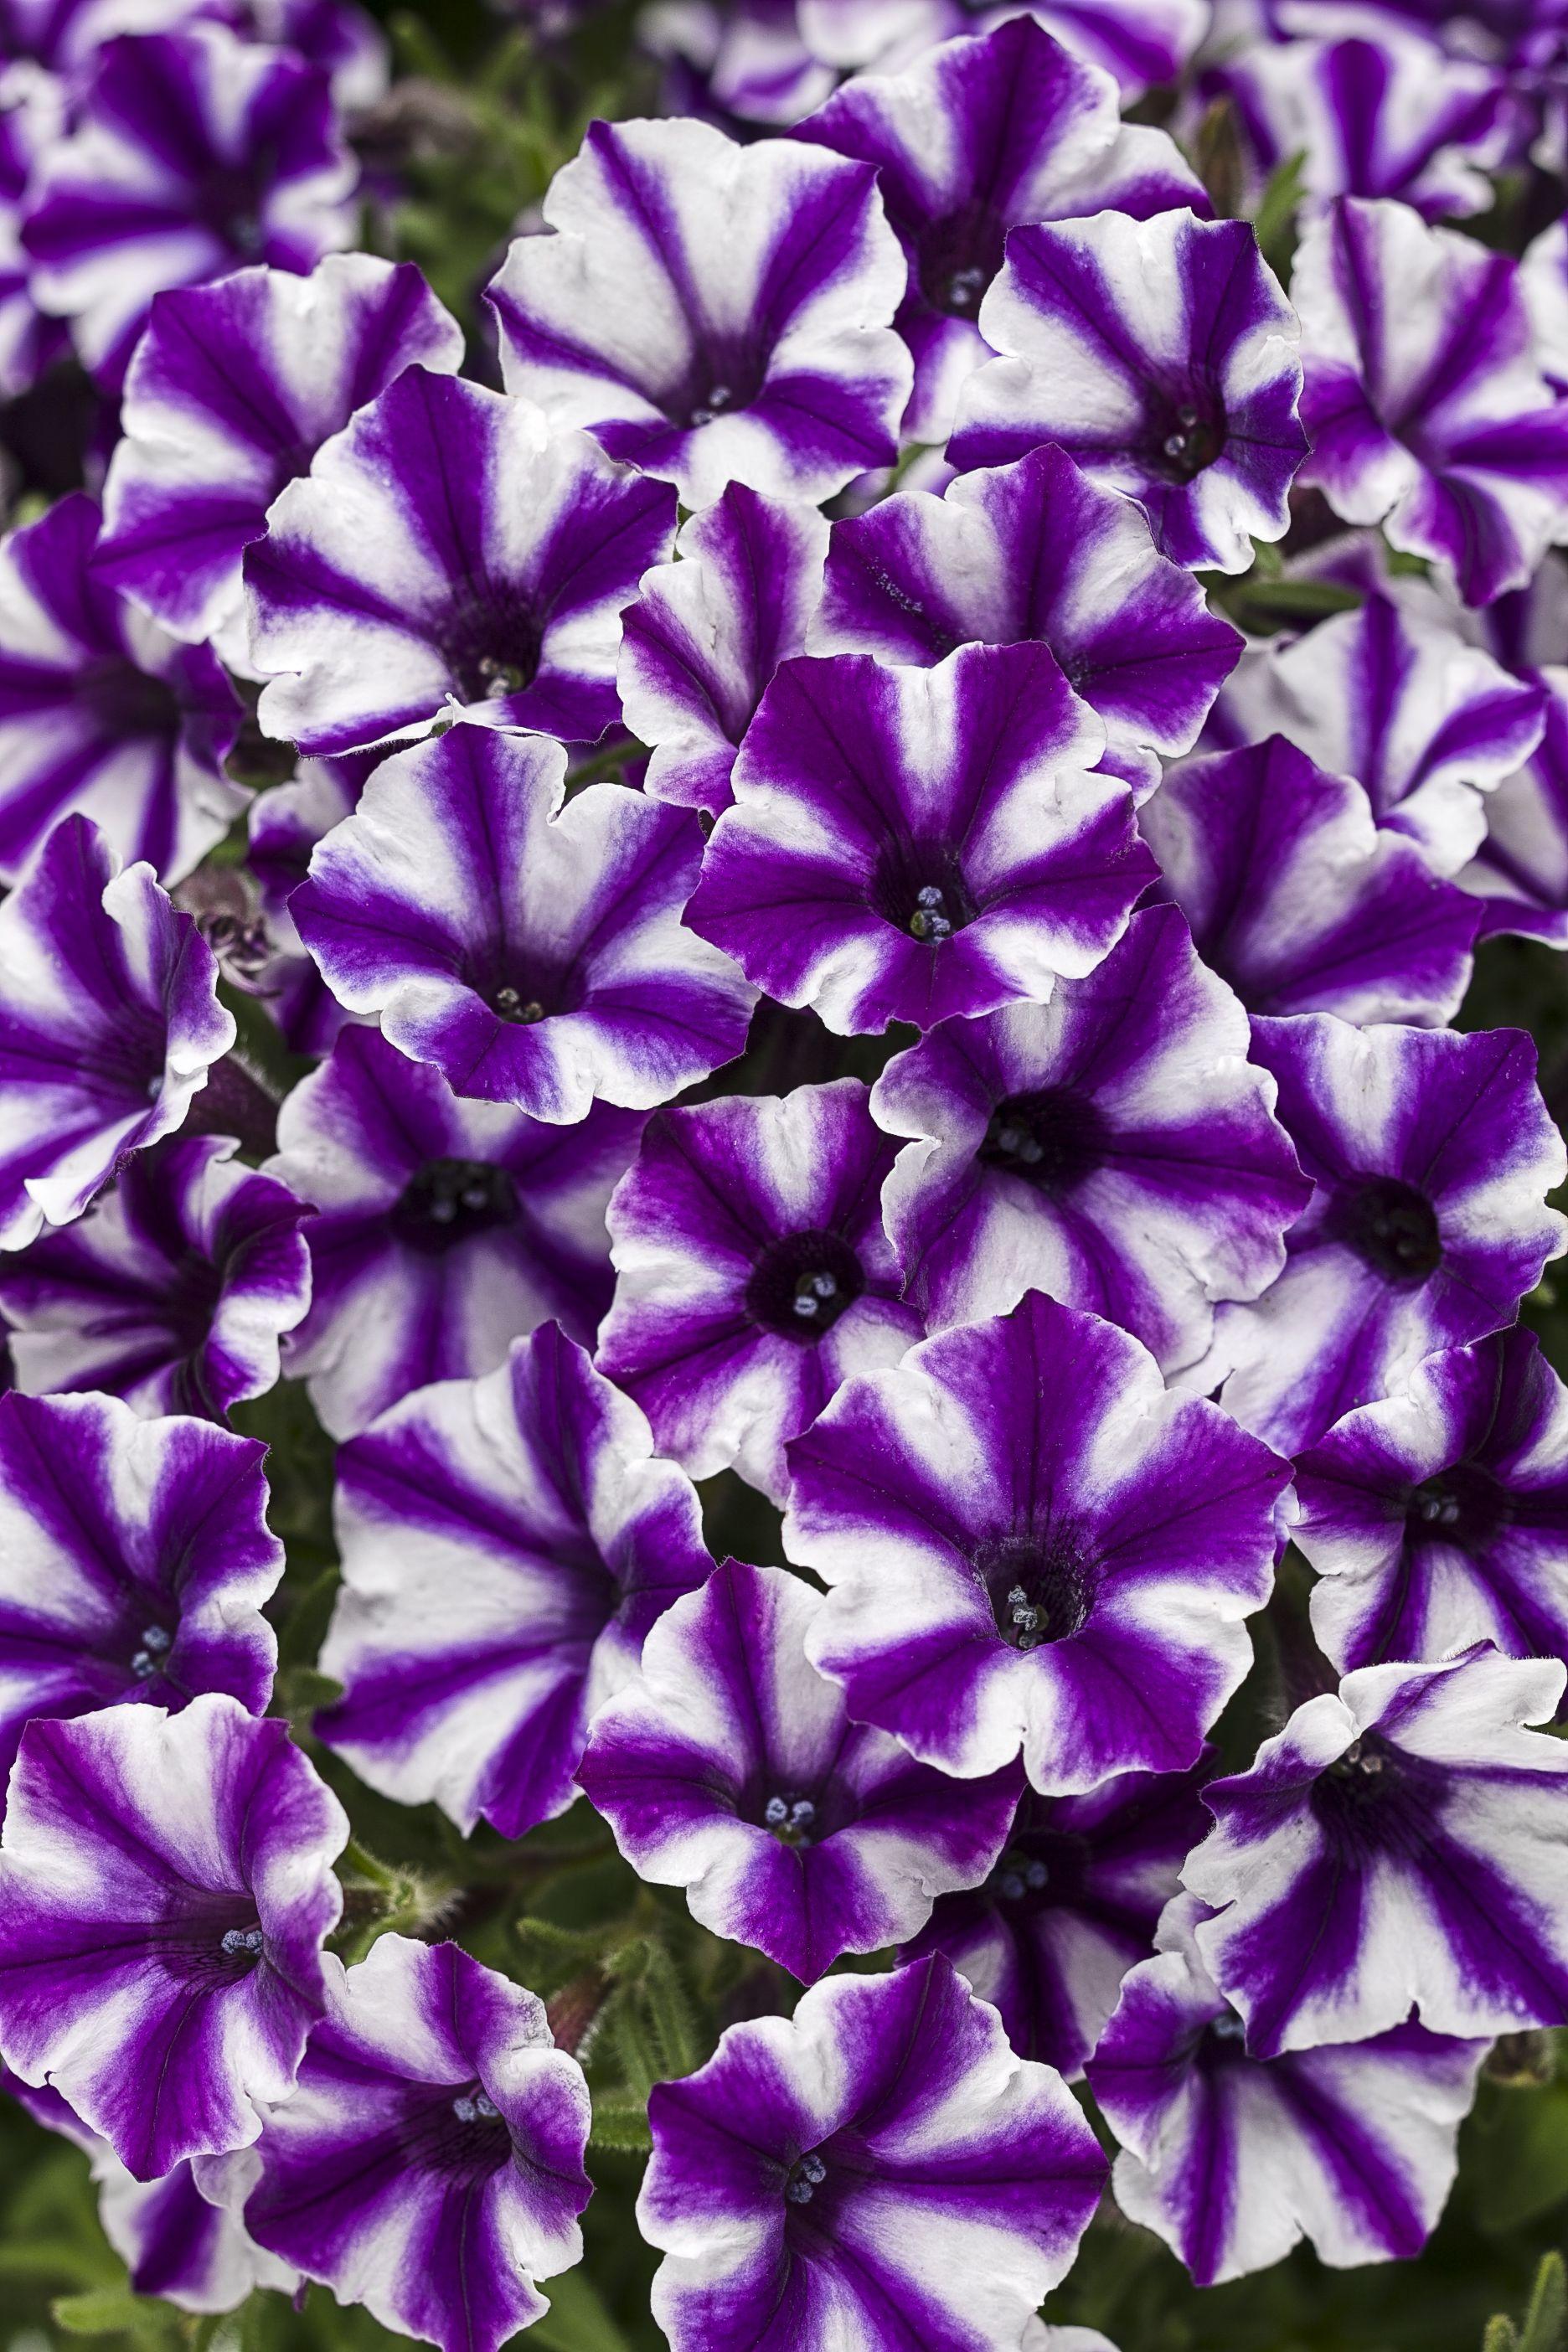 Supertunia Violet Star Charm Petunia Hybrid Petunia Flower Petunia Plant Petunias